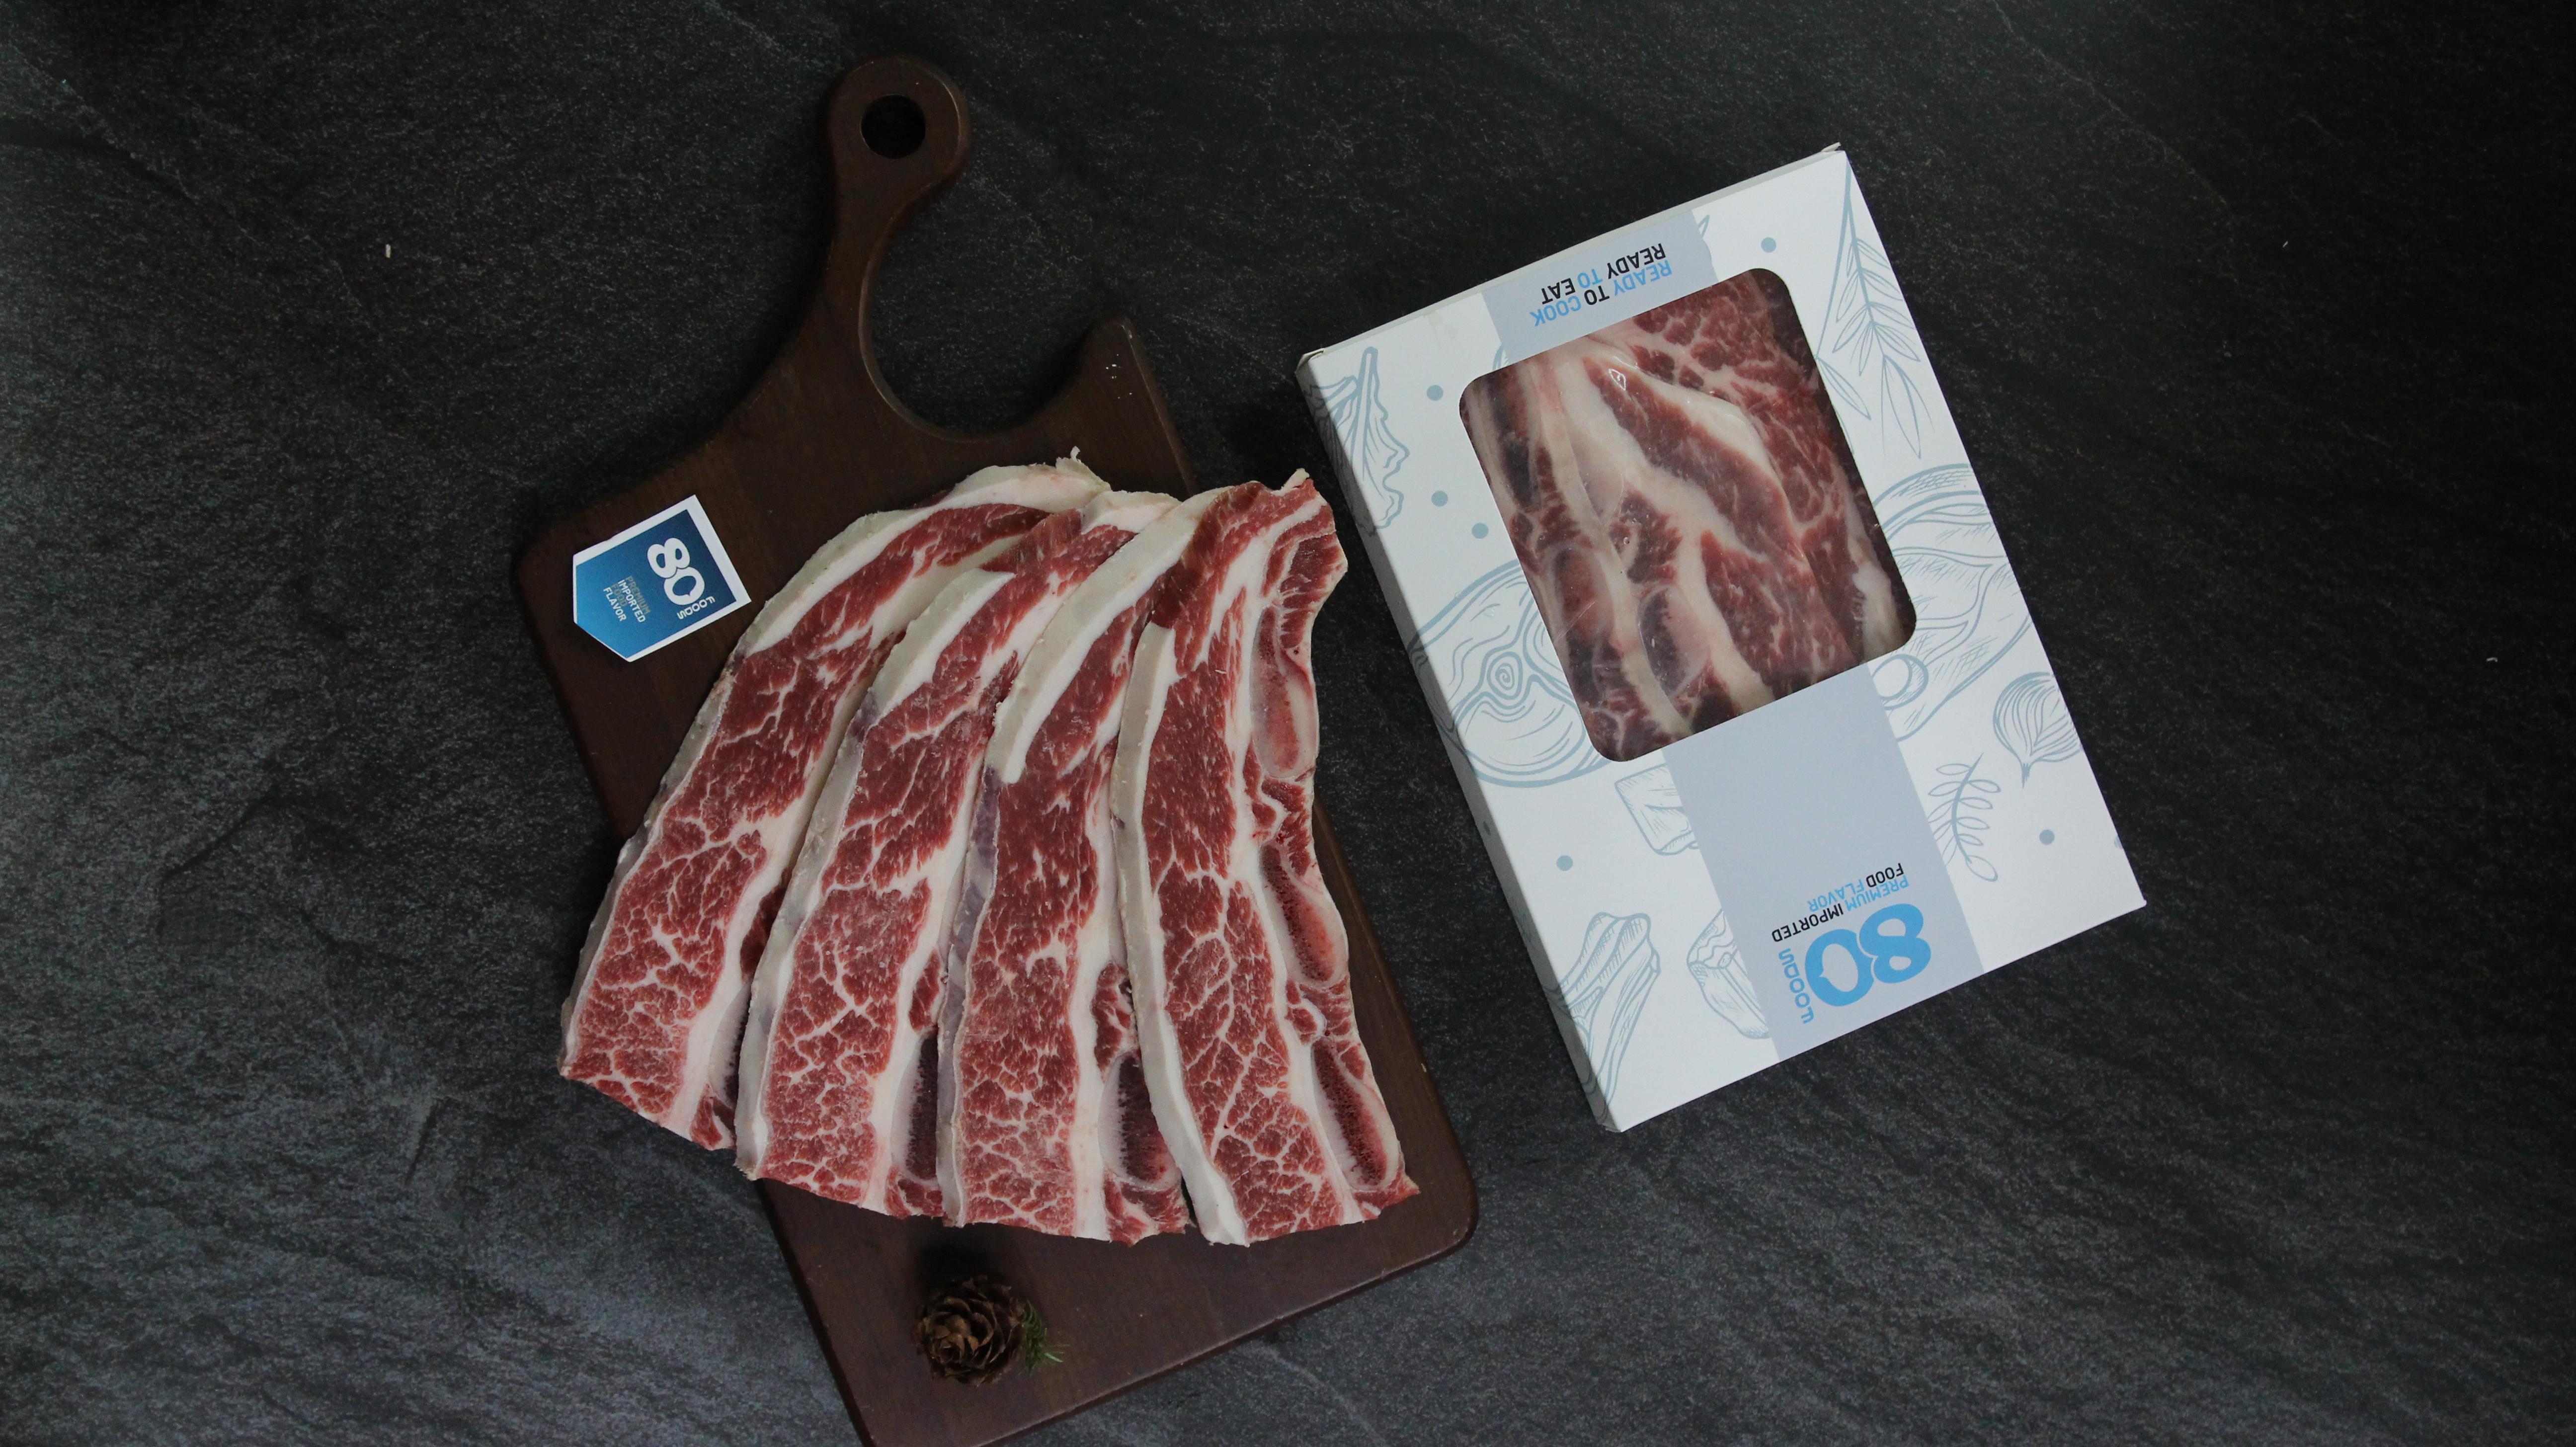 Thịt bò Mỹ nhập khẩu taị 80FOODS